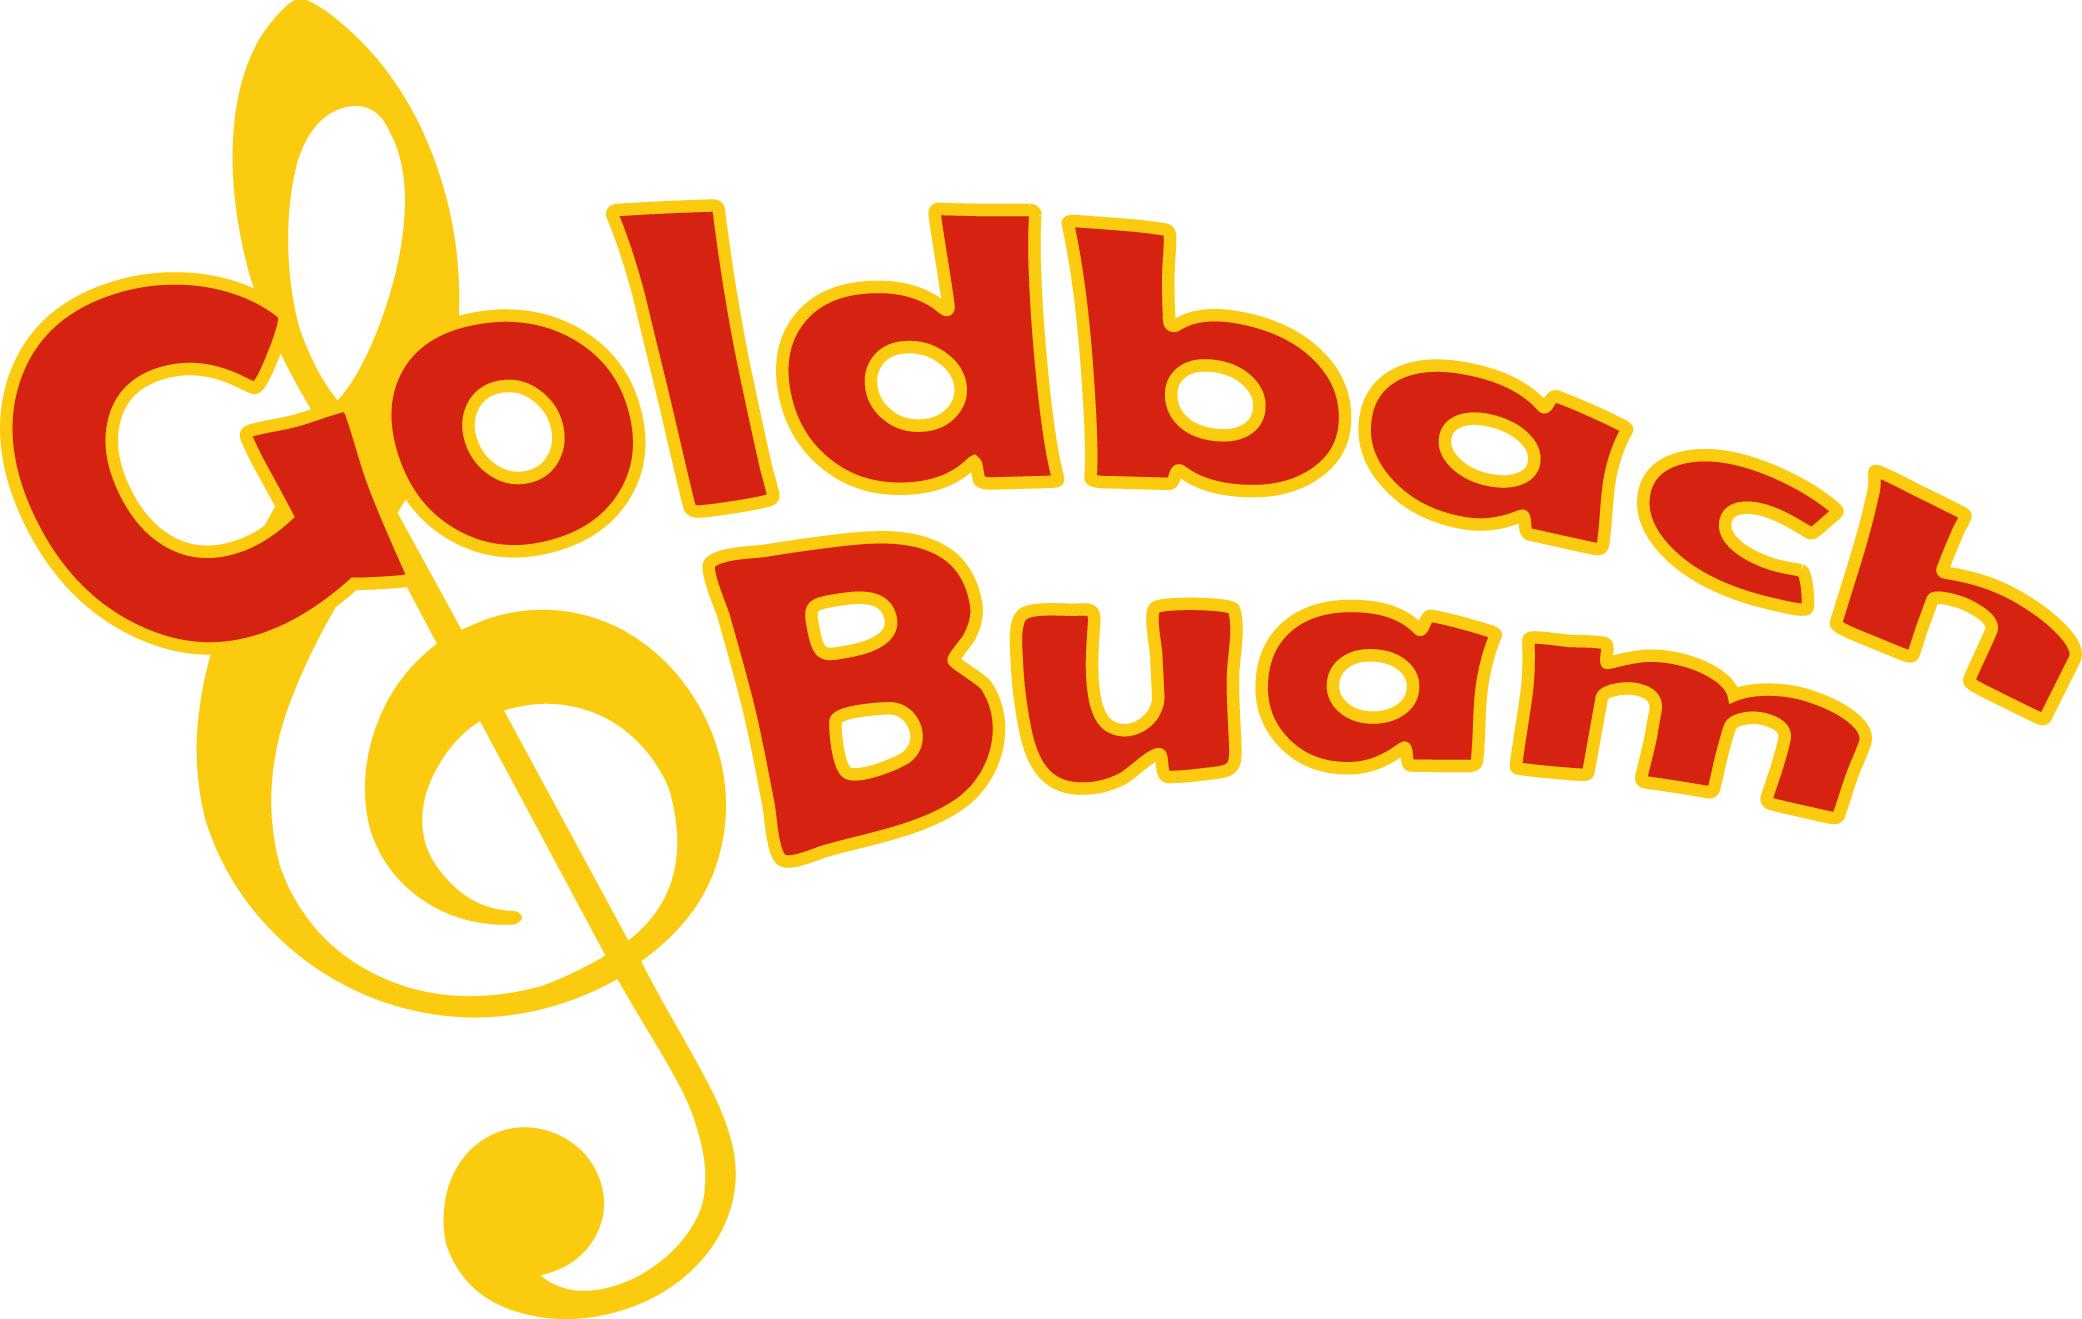 Goldbachbuam 2016